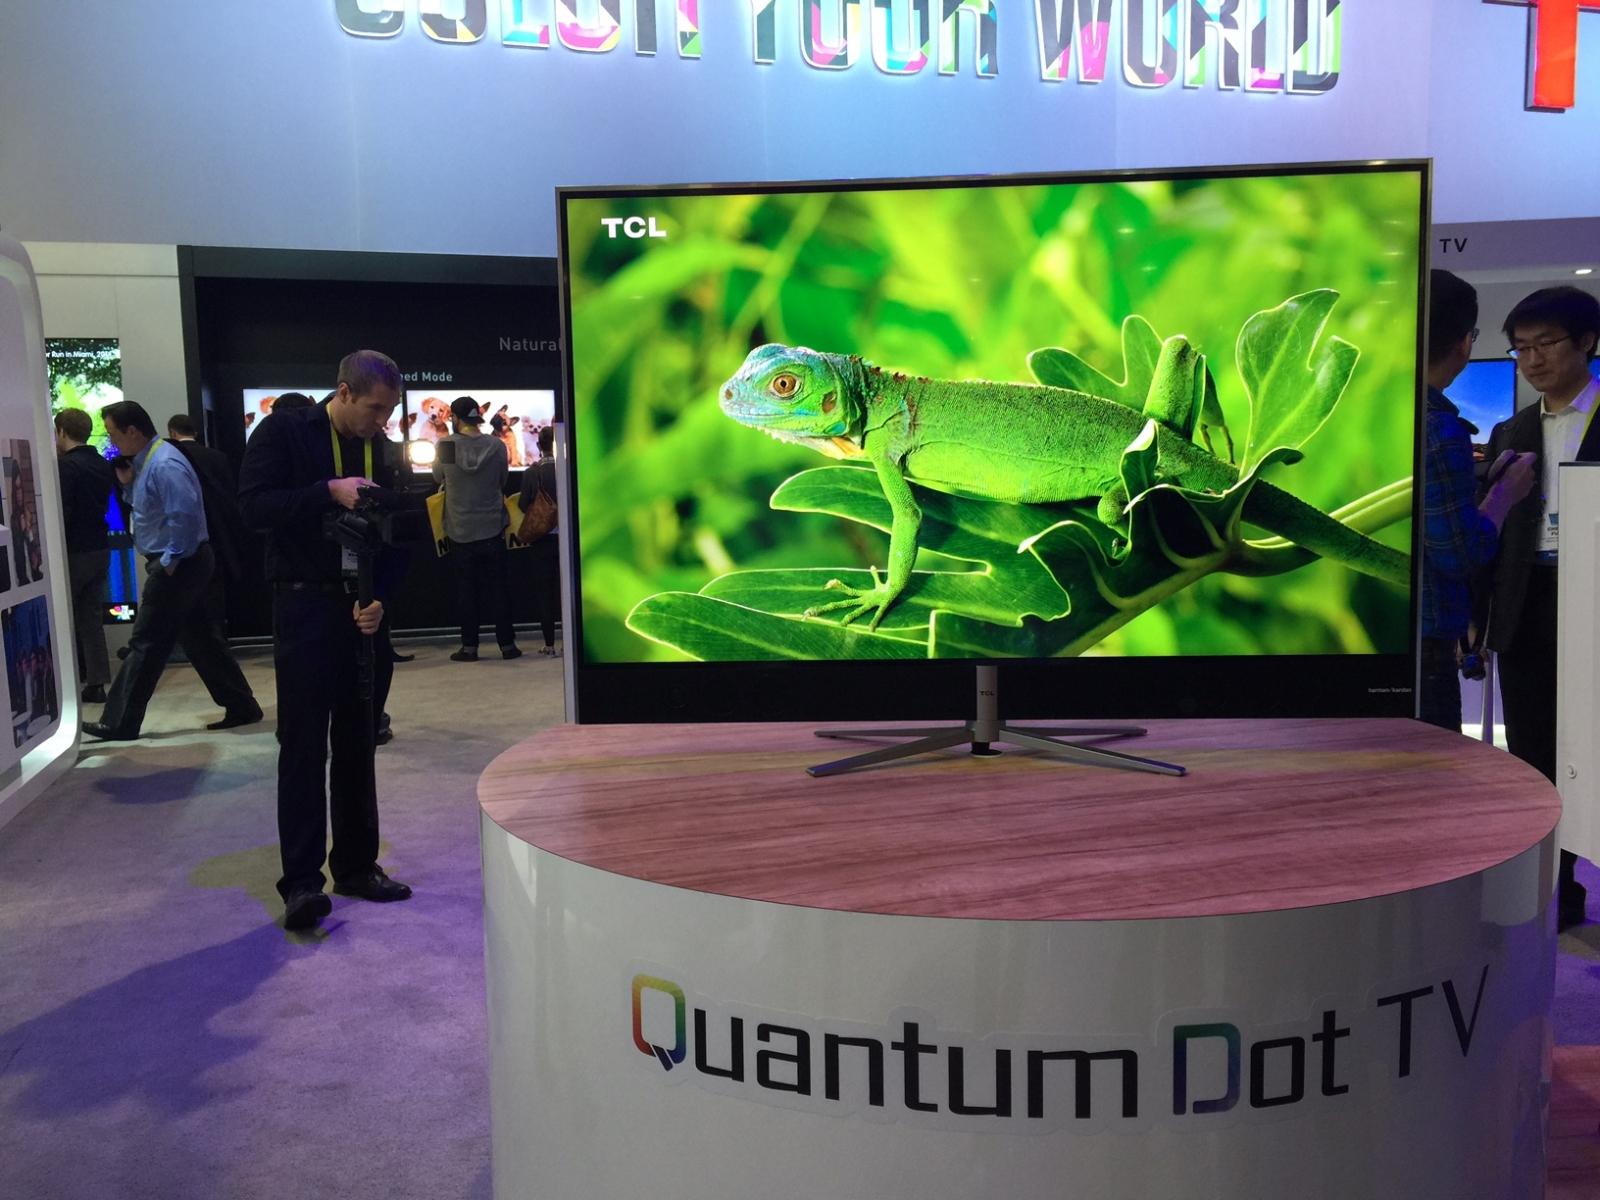 TCL H9700 Quantum Dot 4K TV